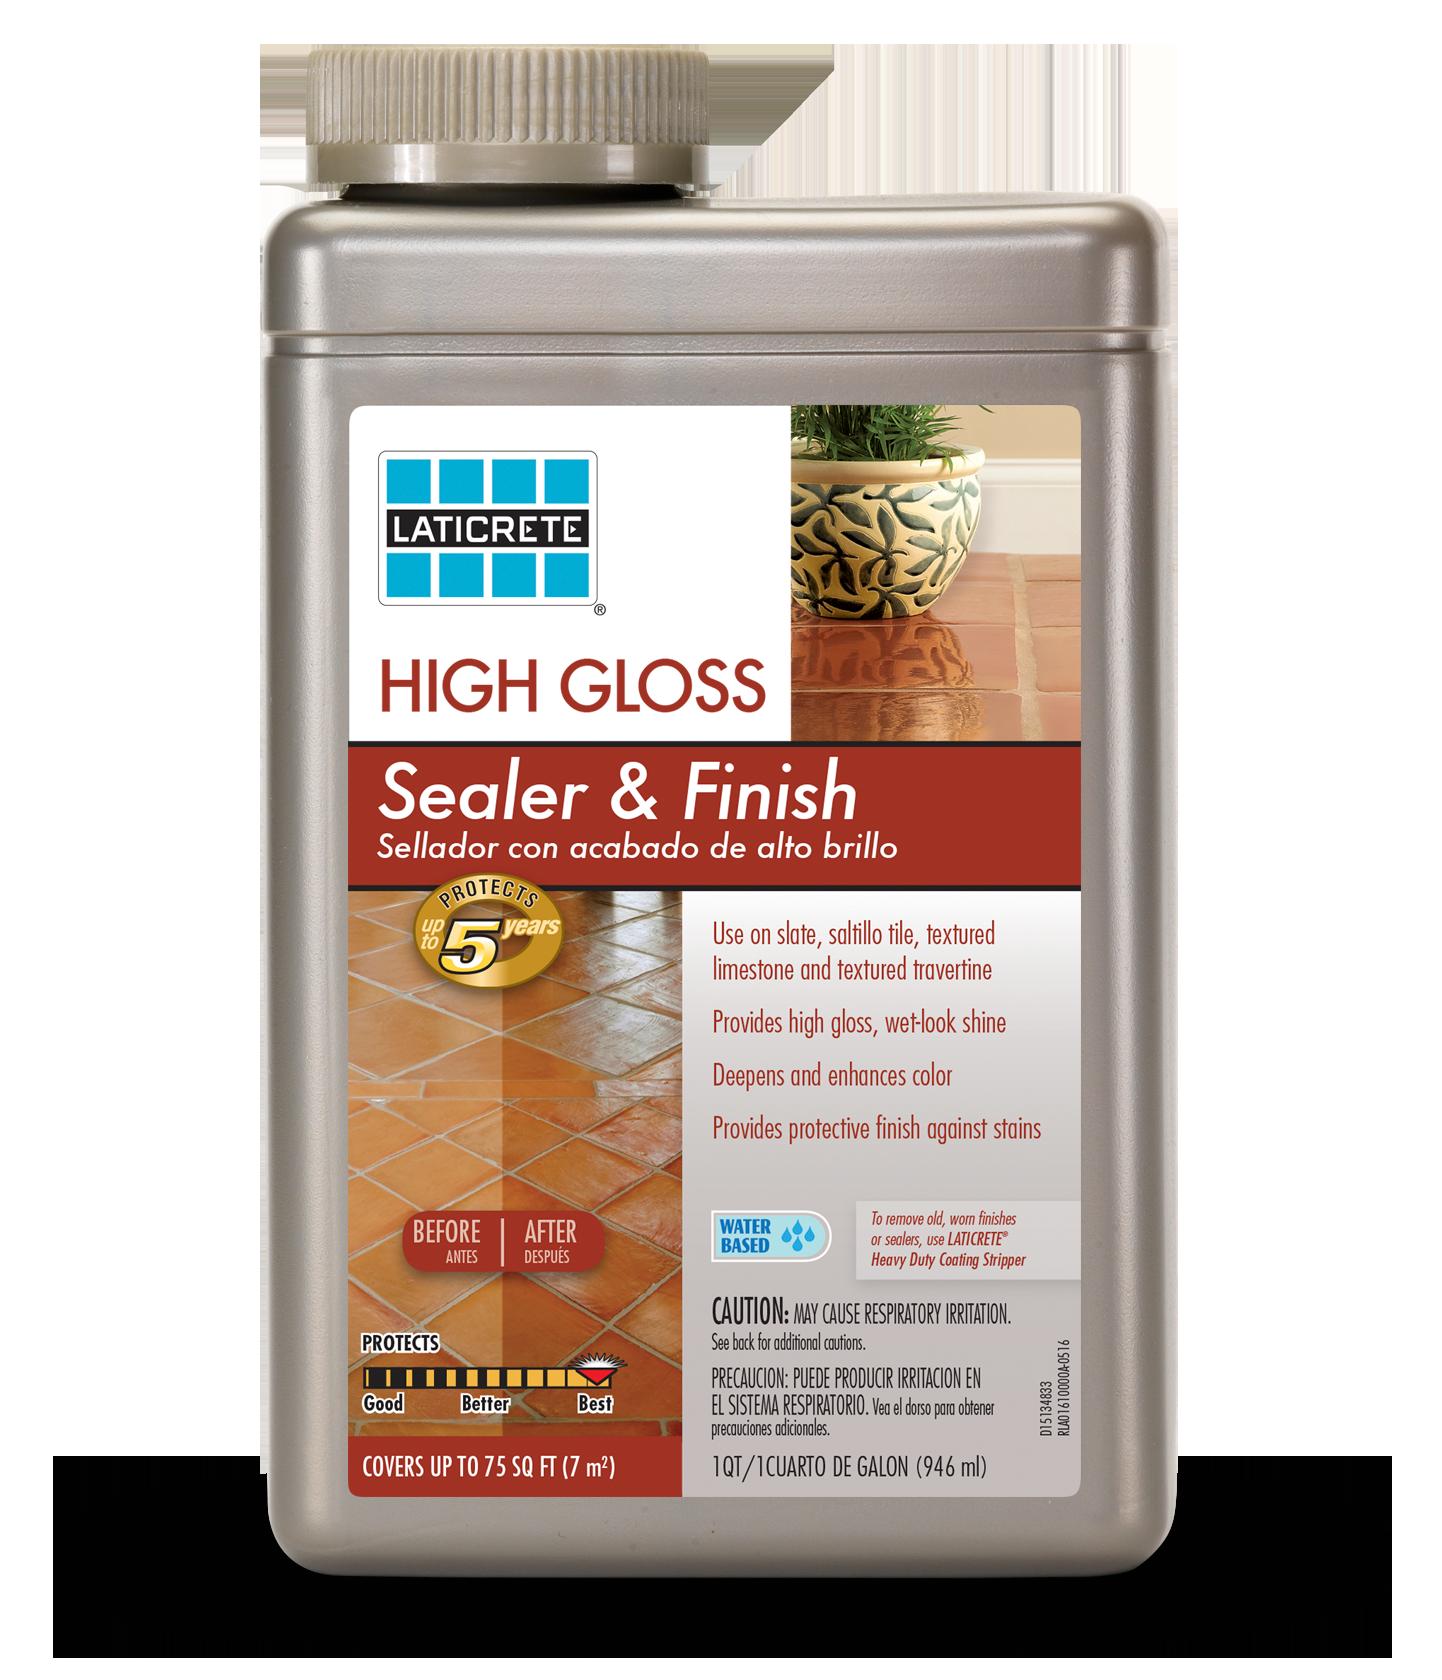 Dupont High Gloss Sealer: High Gloss Sealer Finish